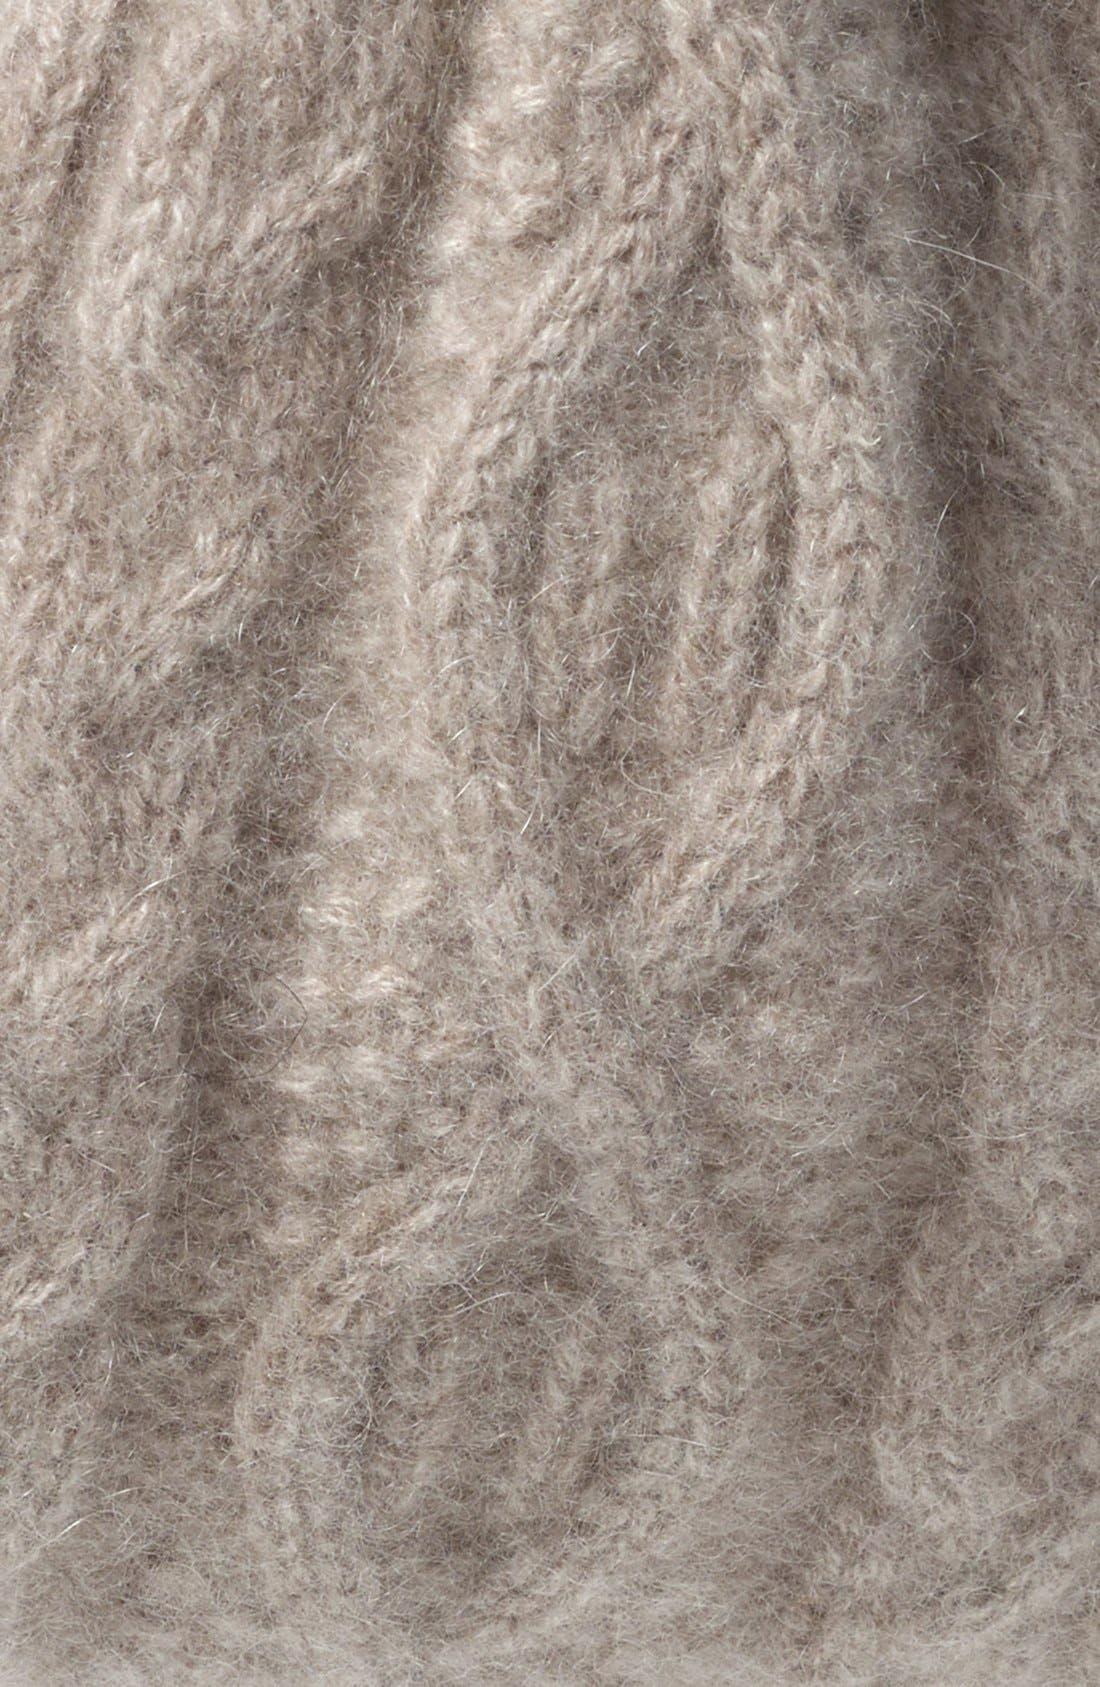 Convertible Cable Knit Cashmere Head Wrap,                             Alternate thumbnail 2, color,                             250